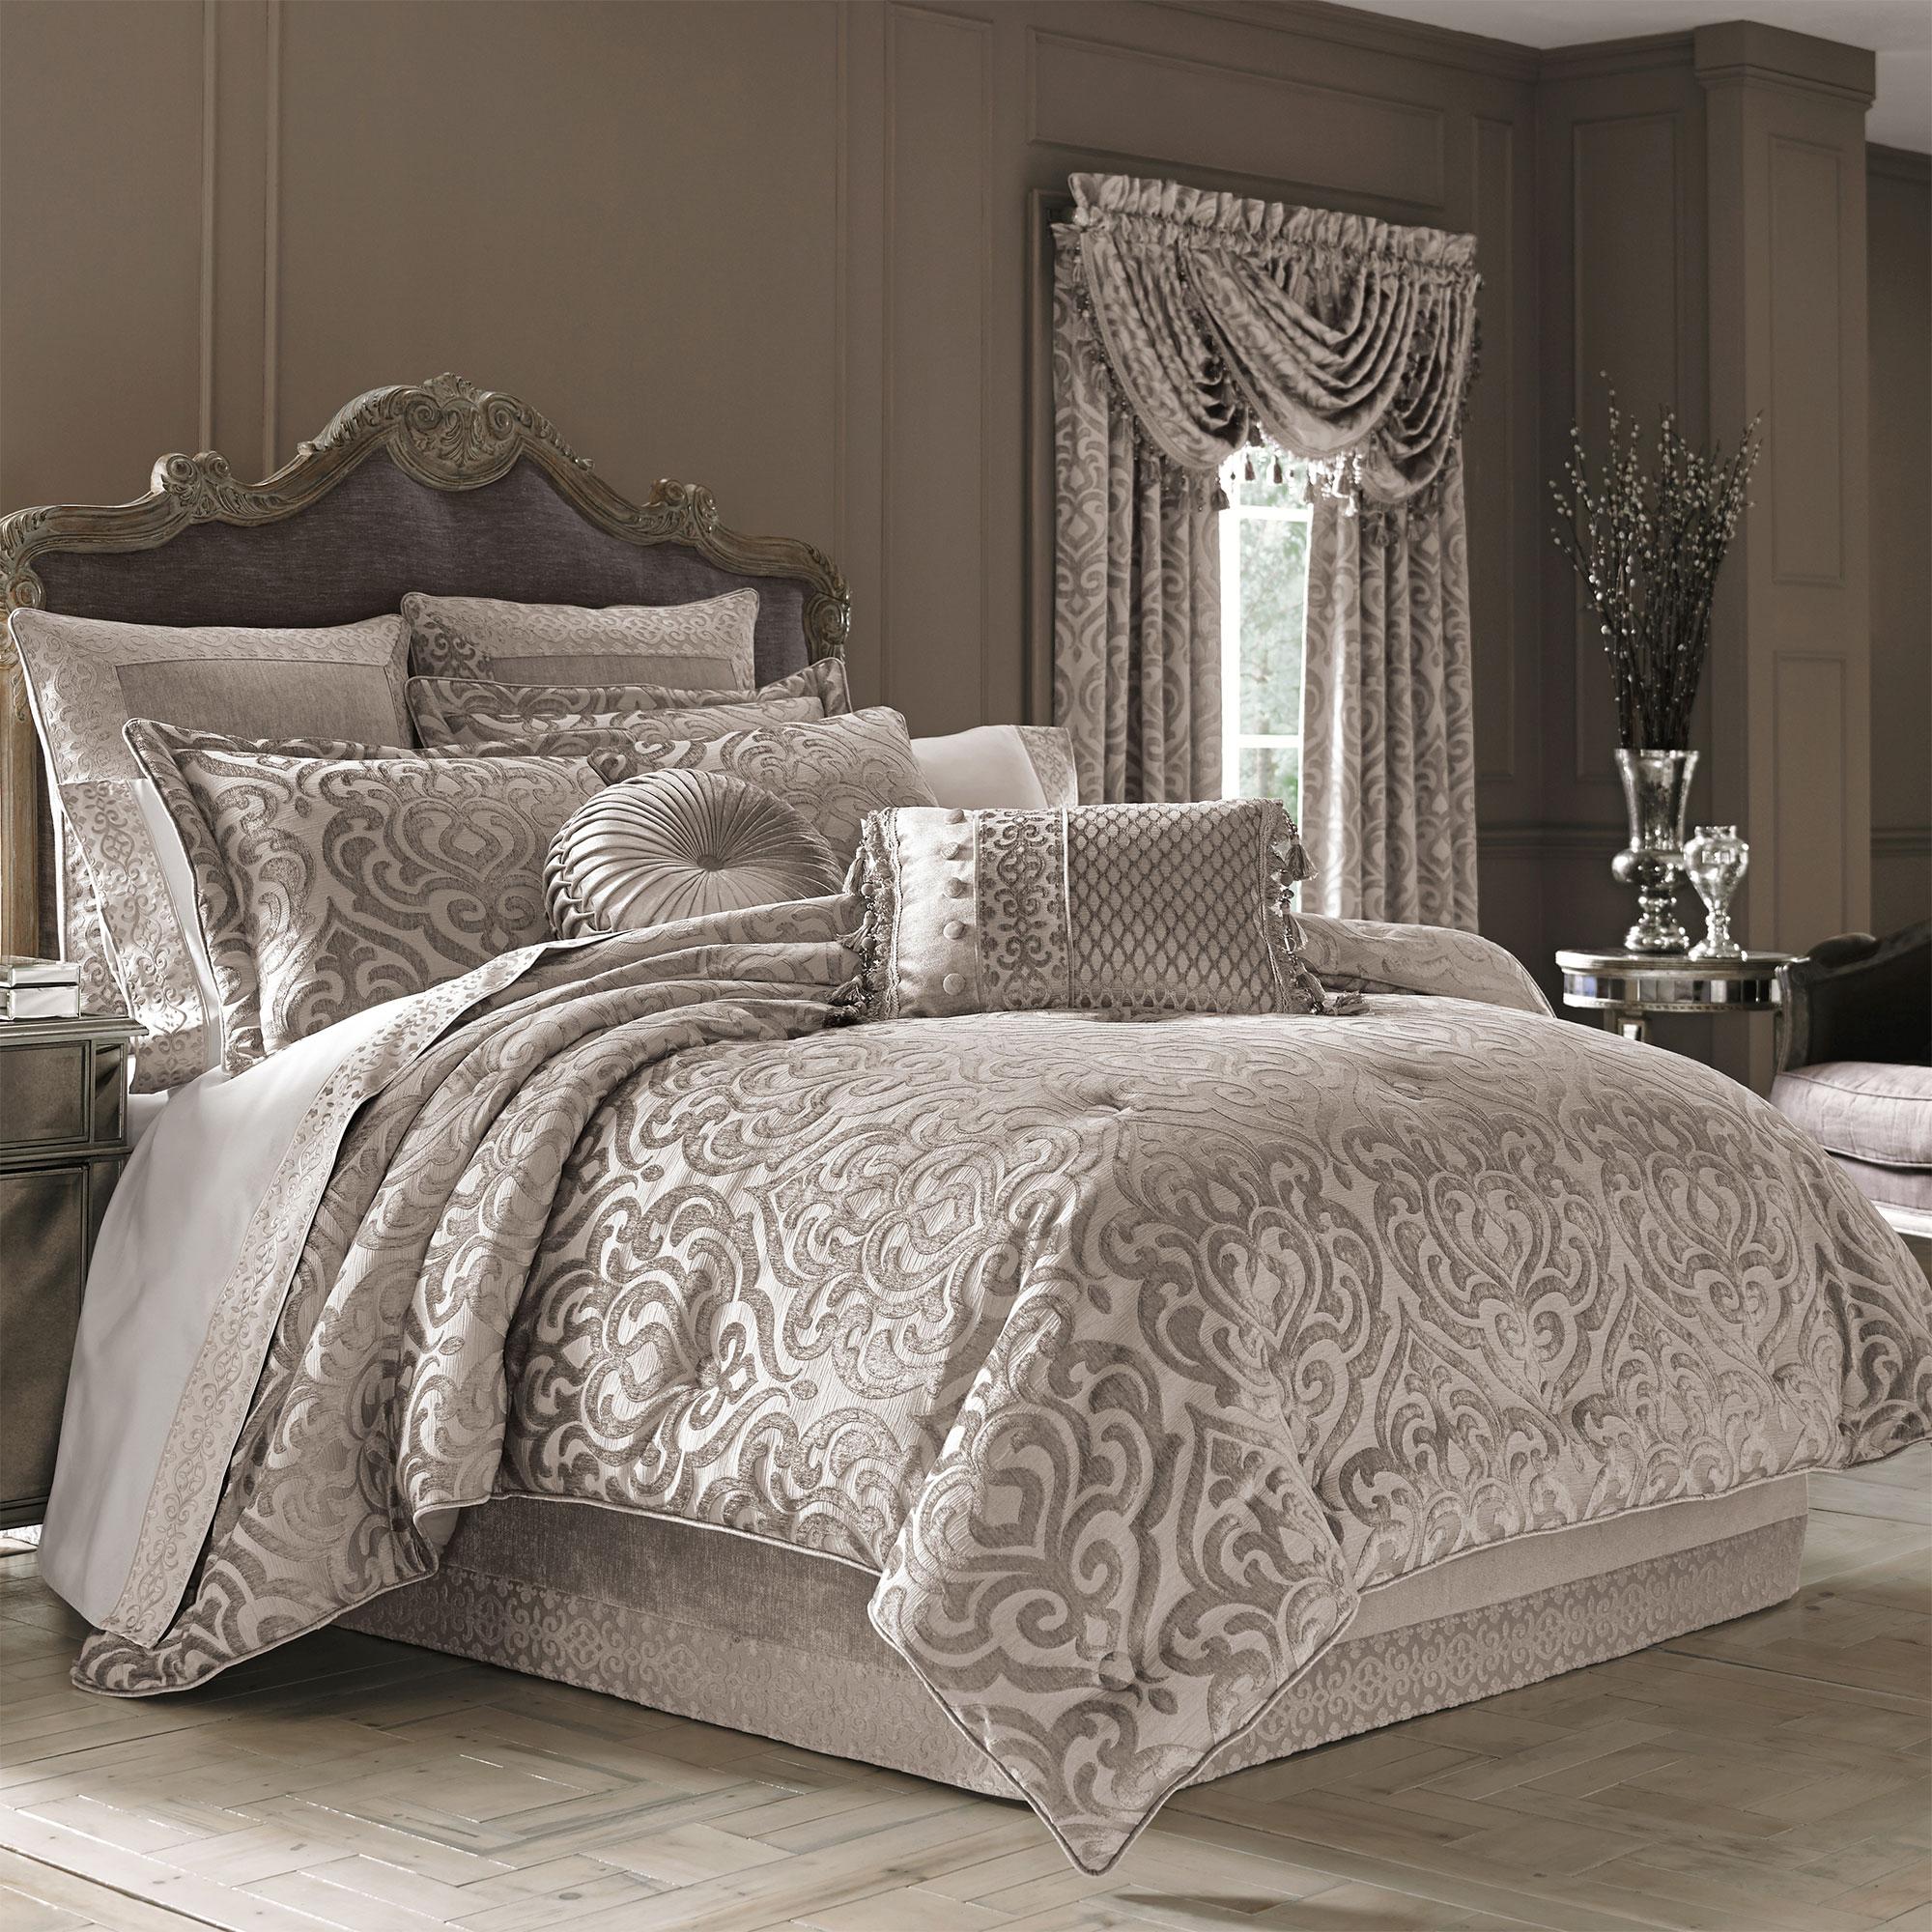 Comforter Sets.Sicily Pearl Full 4 Piece Comforter Set